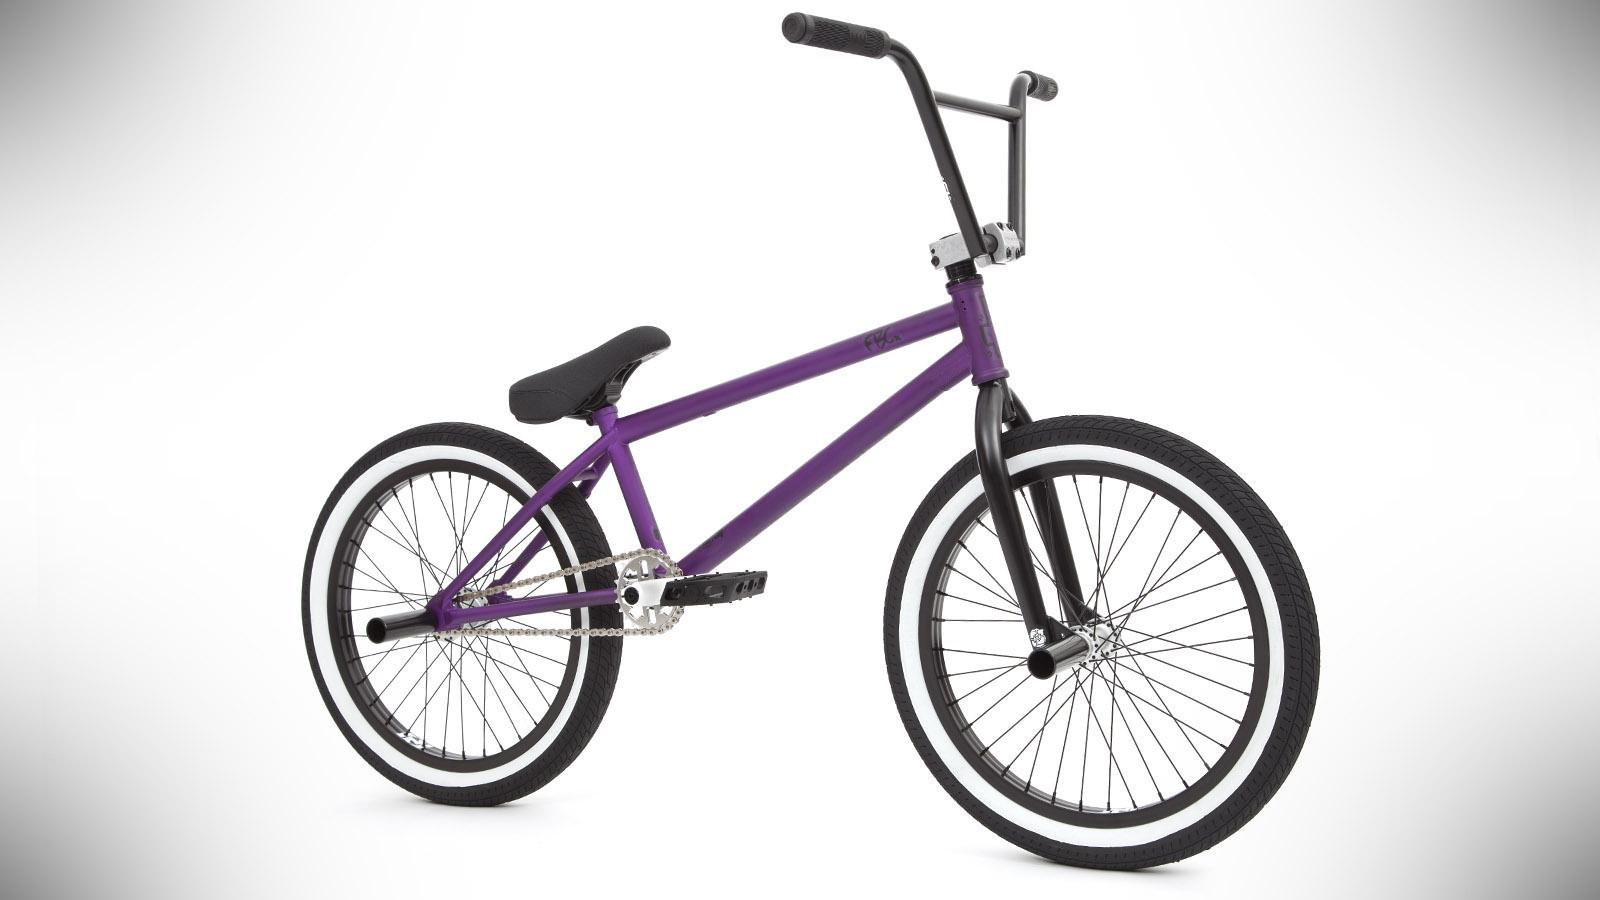 fit-benny-3-bmx-bike